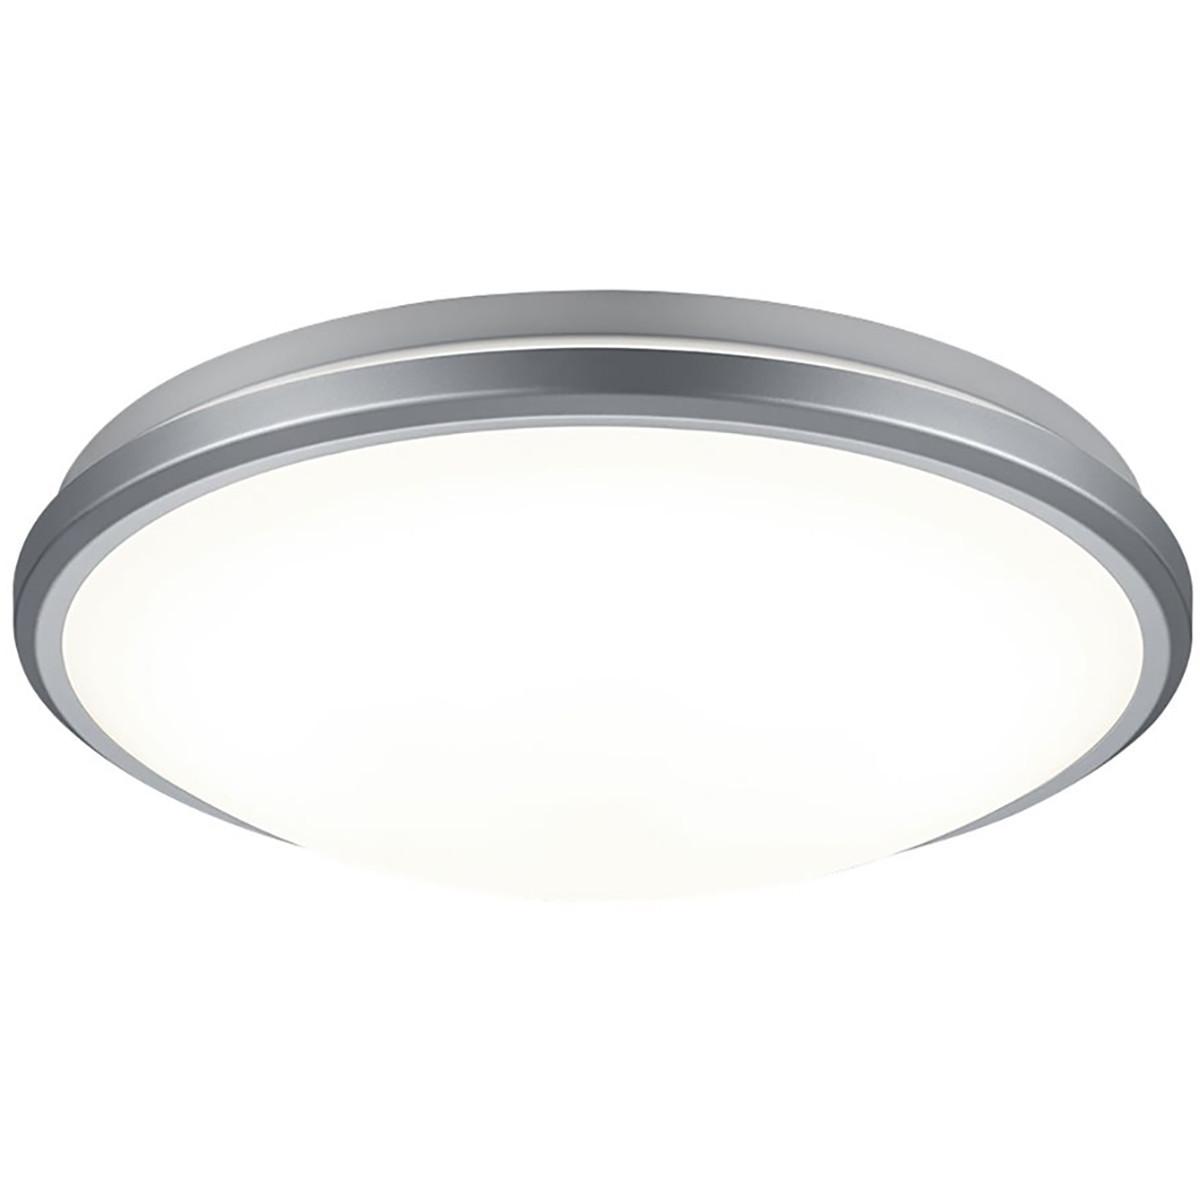 LED Plafondlamp met Bewegingssensor - Trion Alca - Opbouw Rond 12W - Warm Wit 3000K - 360° - Mat Tit